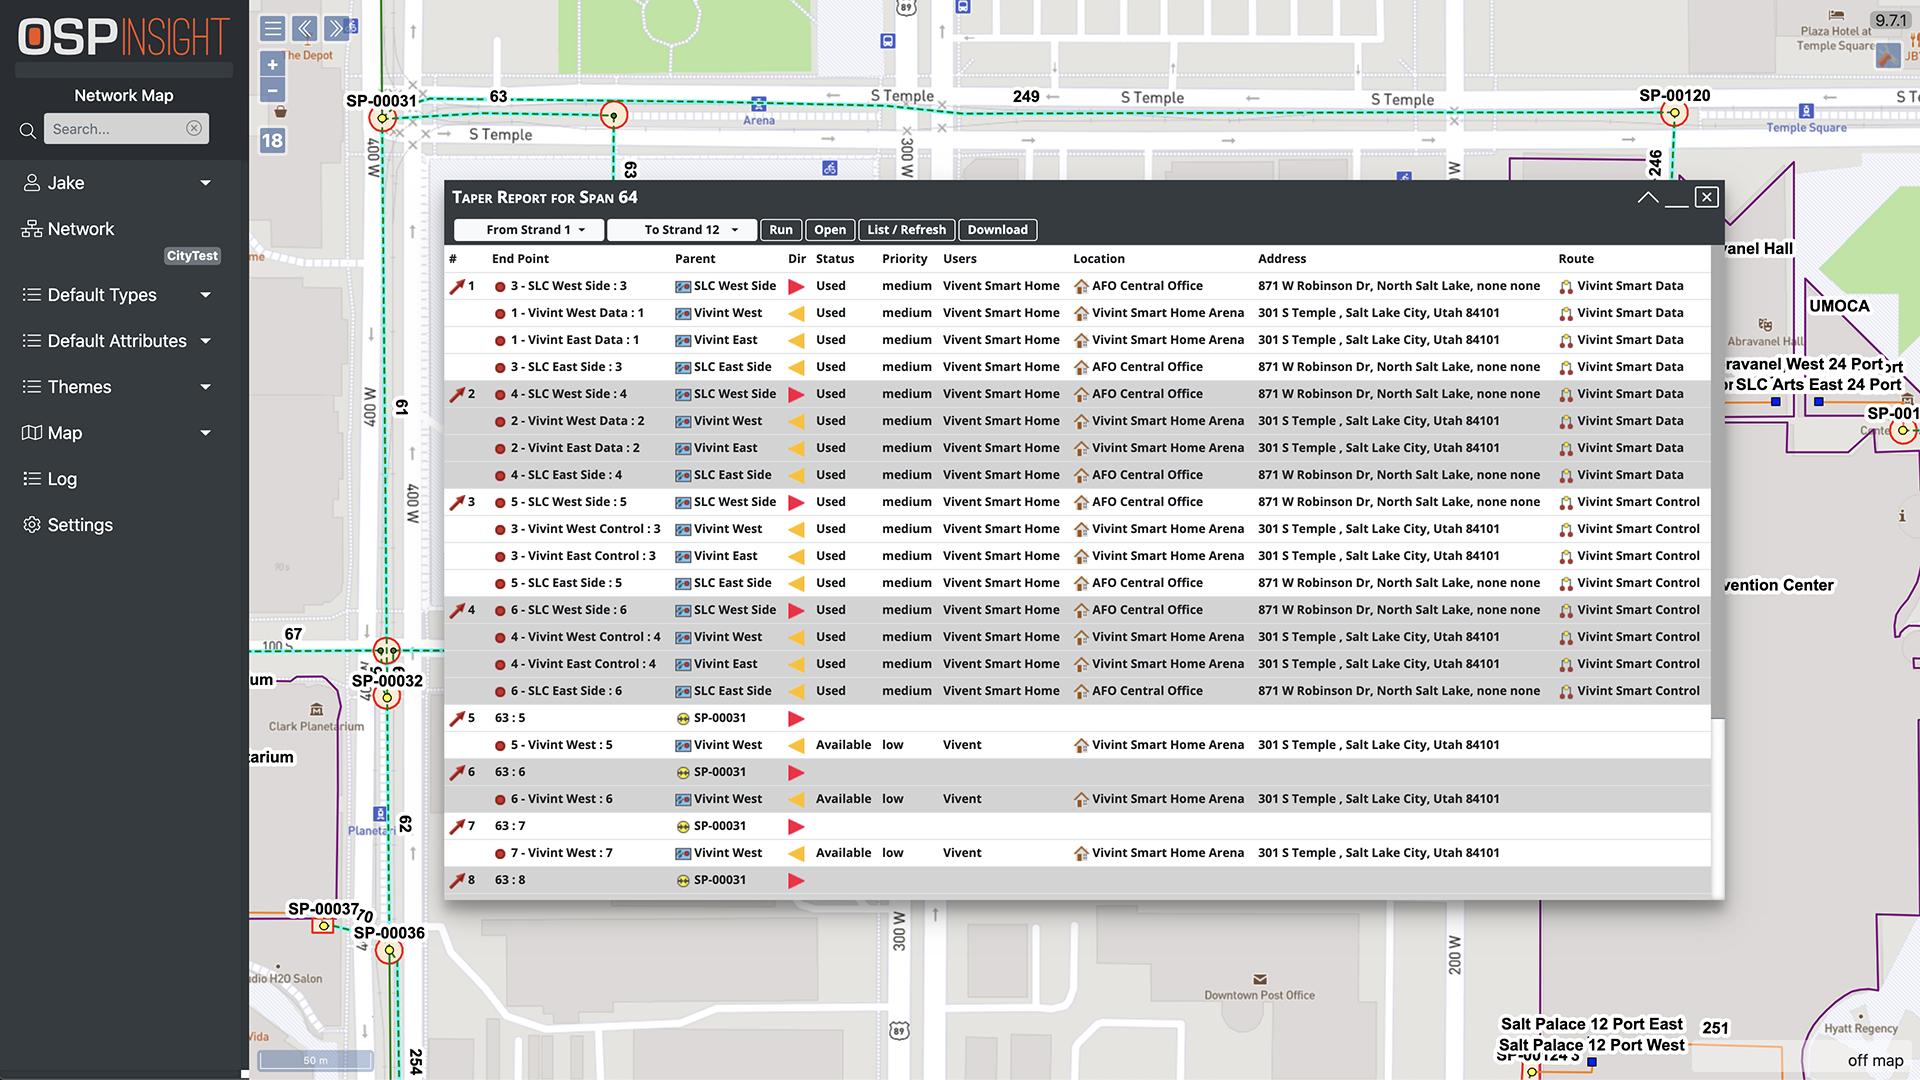 OSPInsight Web - Taper Report (Full)